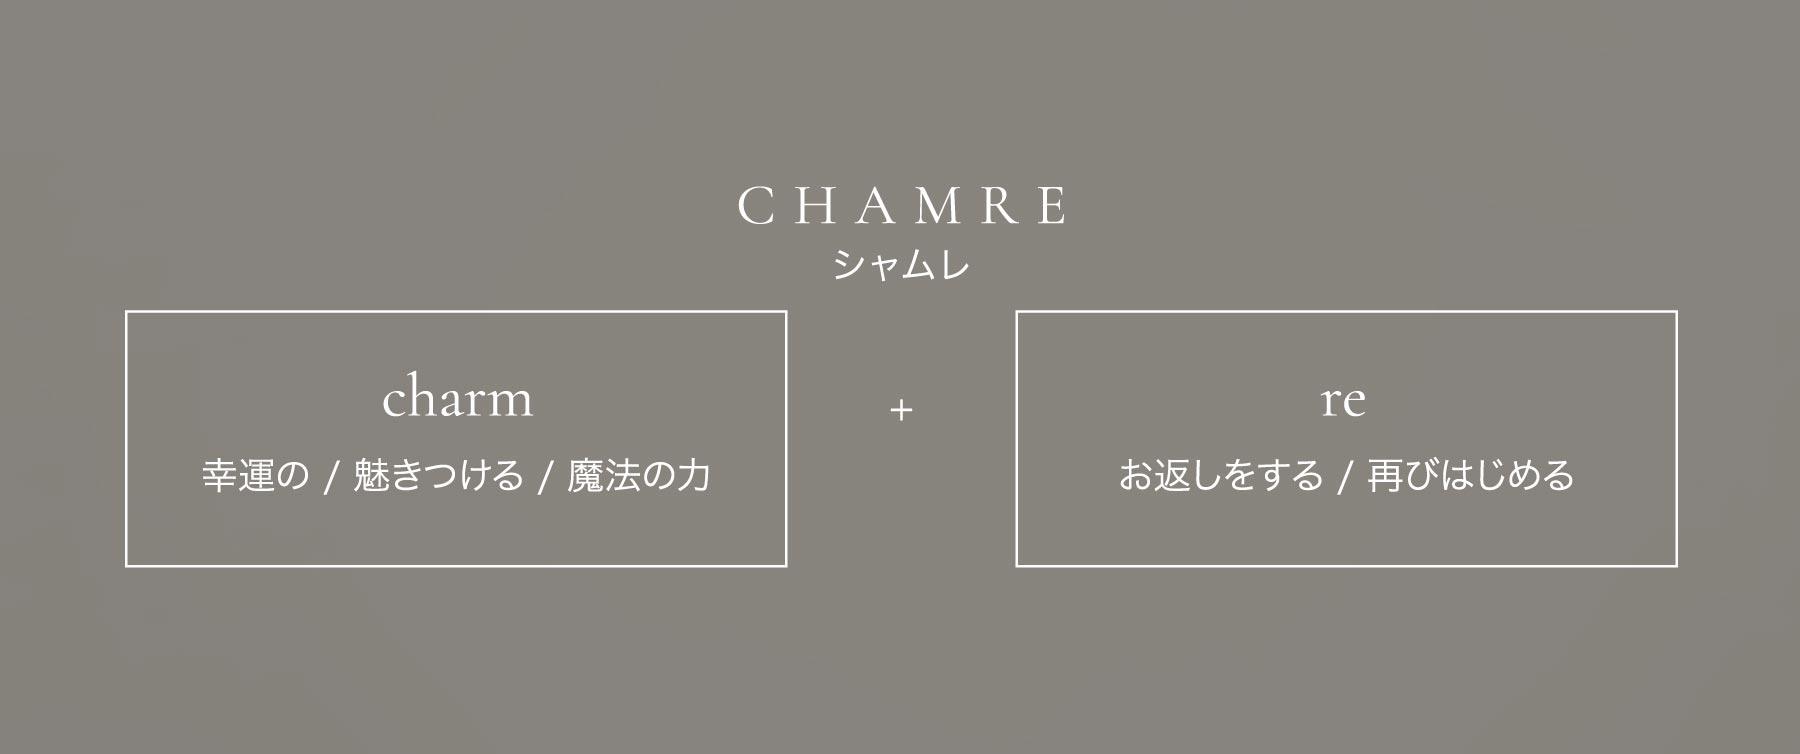 Chamre name concept